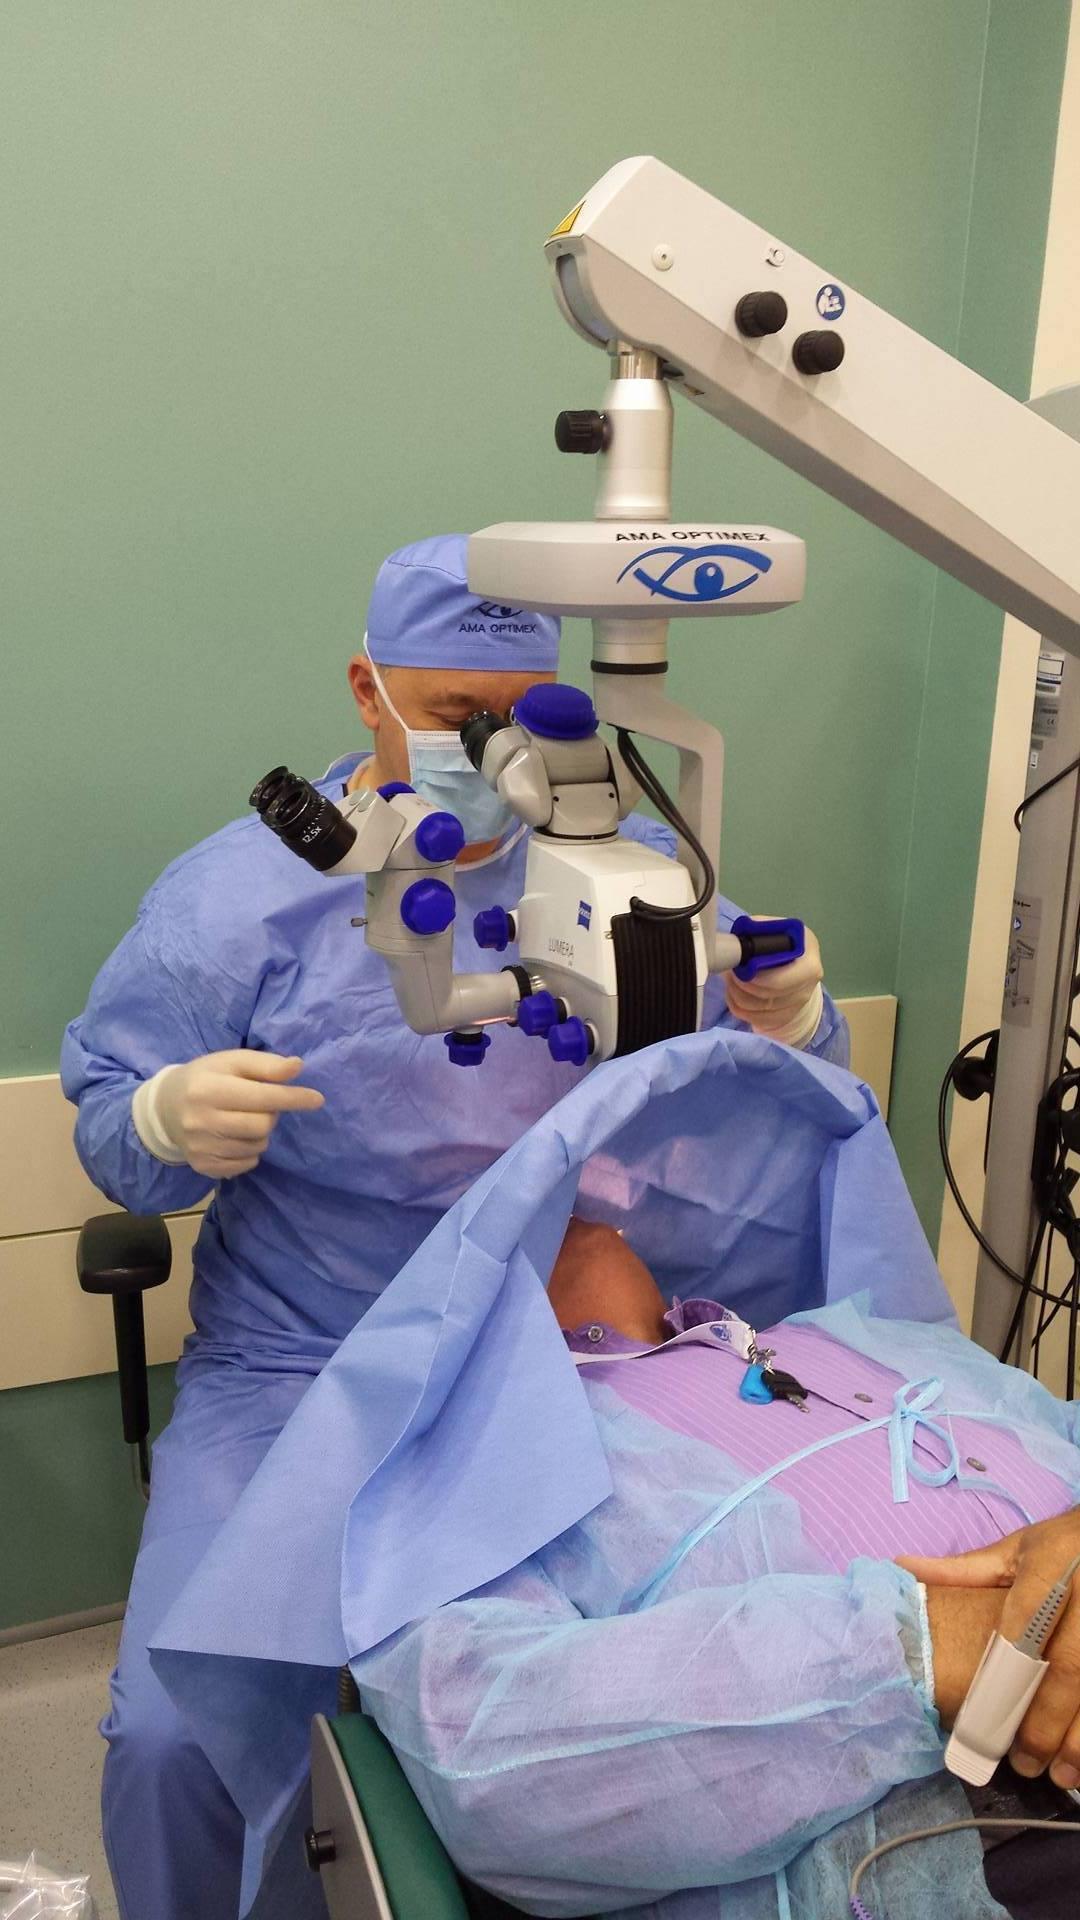 Cataracta: Simptome, Factori de risc & Tratament   7-pitici.ro